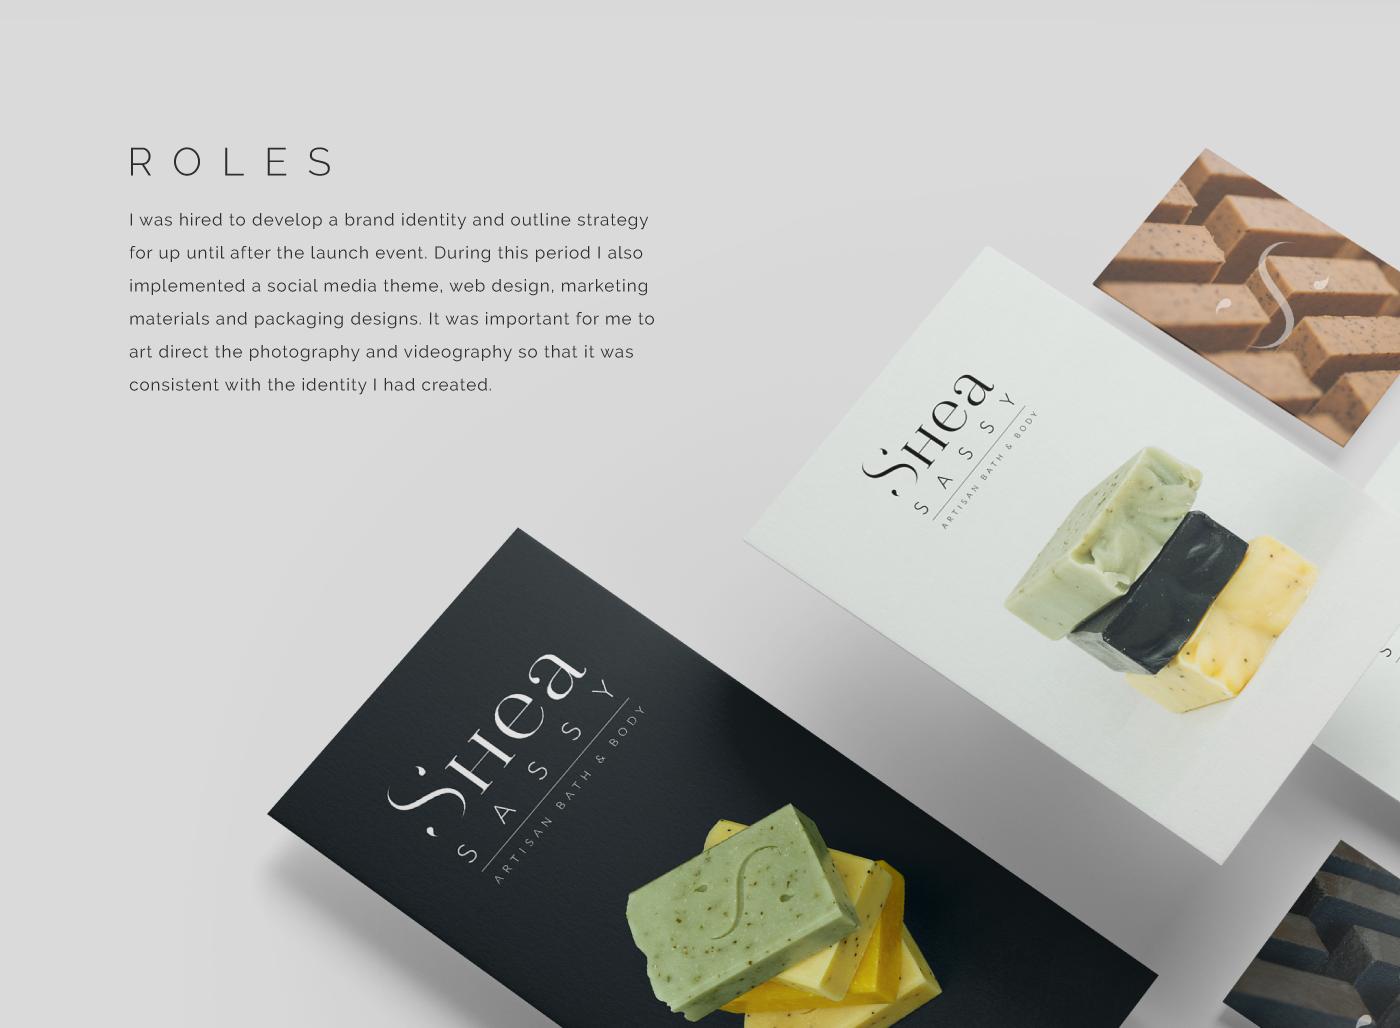 branding  brand identity design graphic design  logo Photography  artisan packaging design luxurious fashionable indulgent